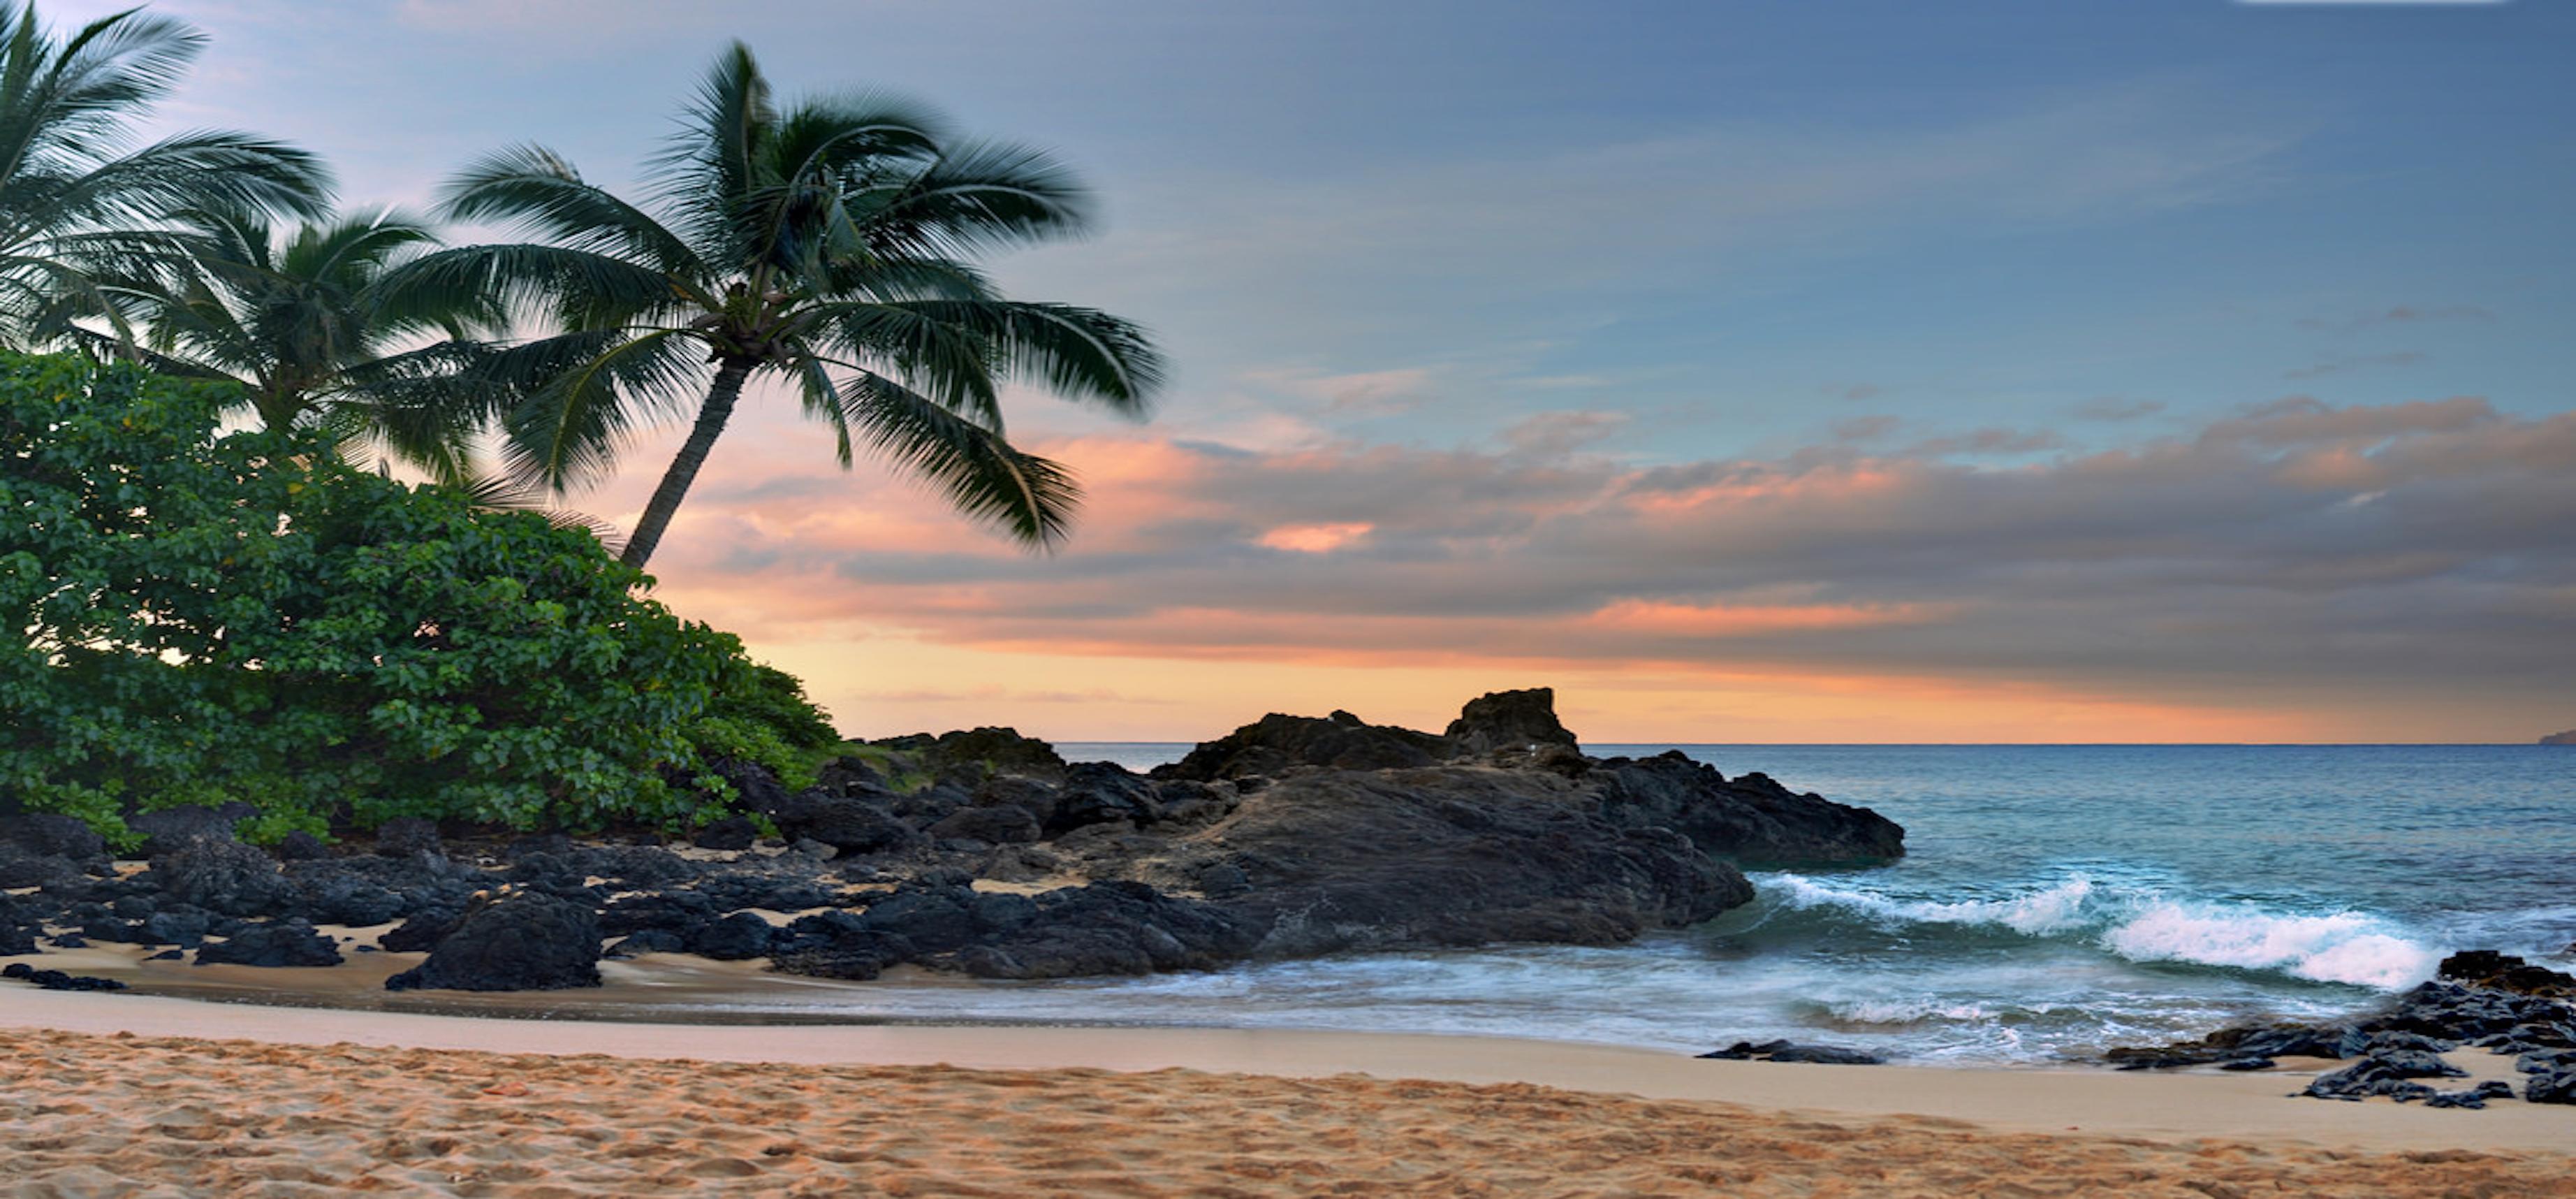 Kaanapali Beach Rentals - Maui - Daniel Parks via Flickr